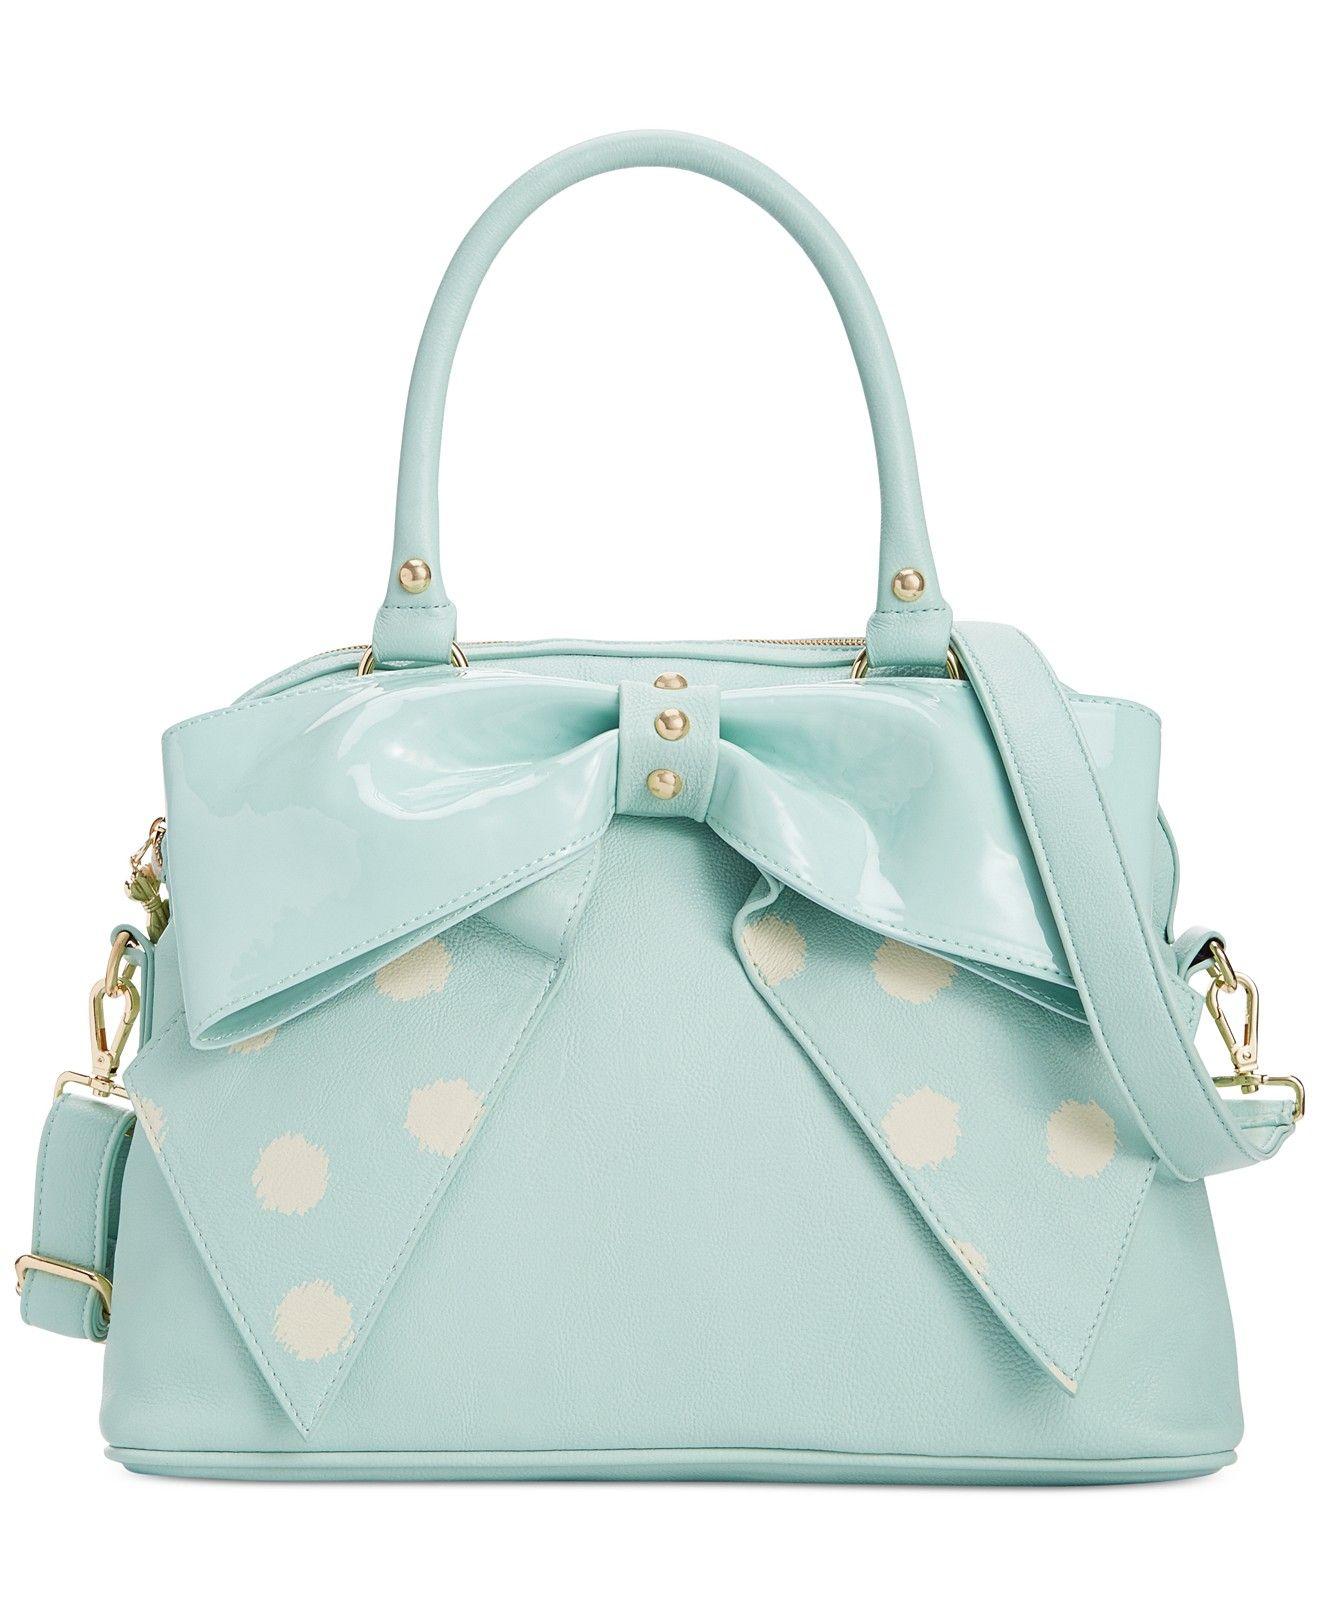 7e13f0c6 Betsey Johnson Macy's Exclusive Dome Satchel - Handbags ...